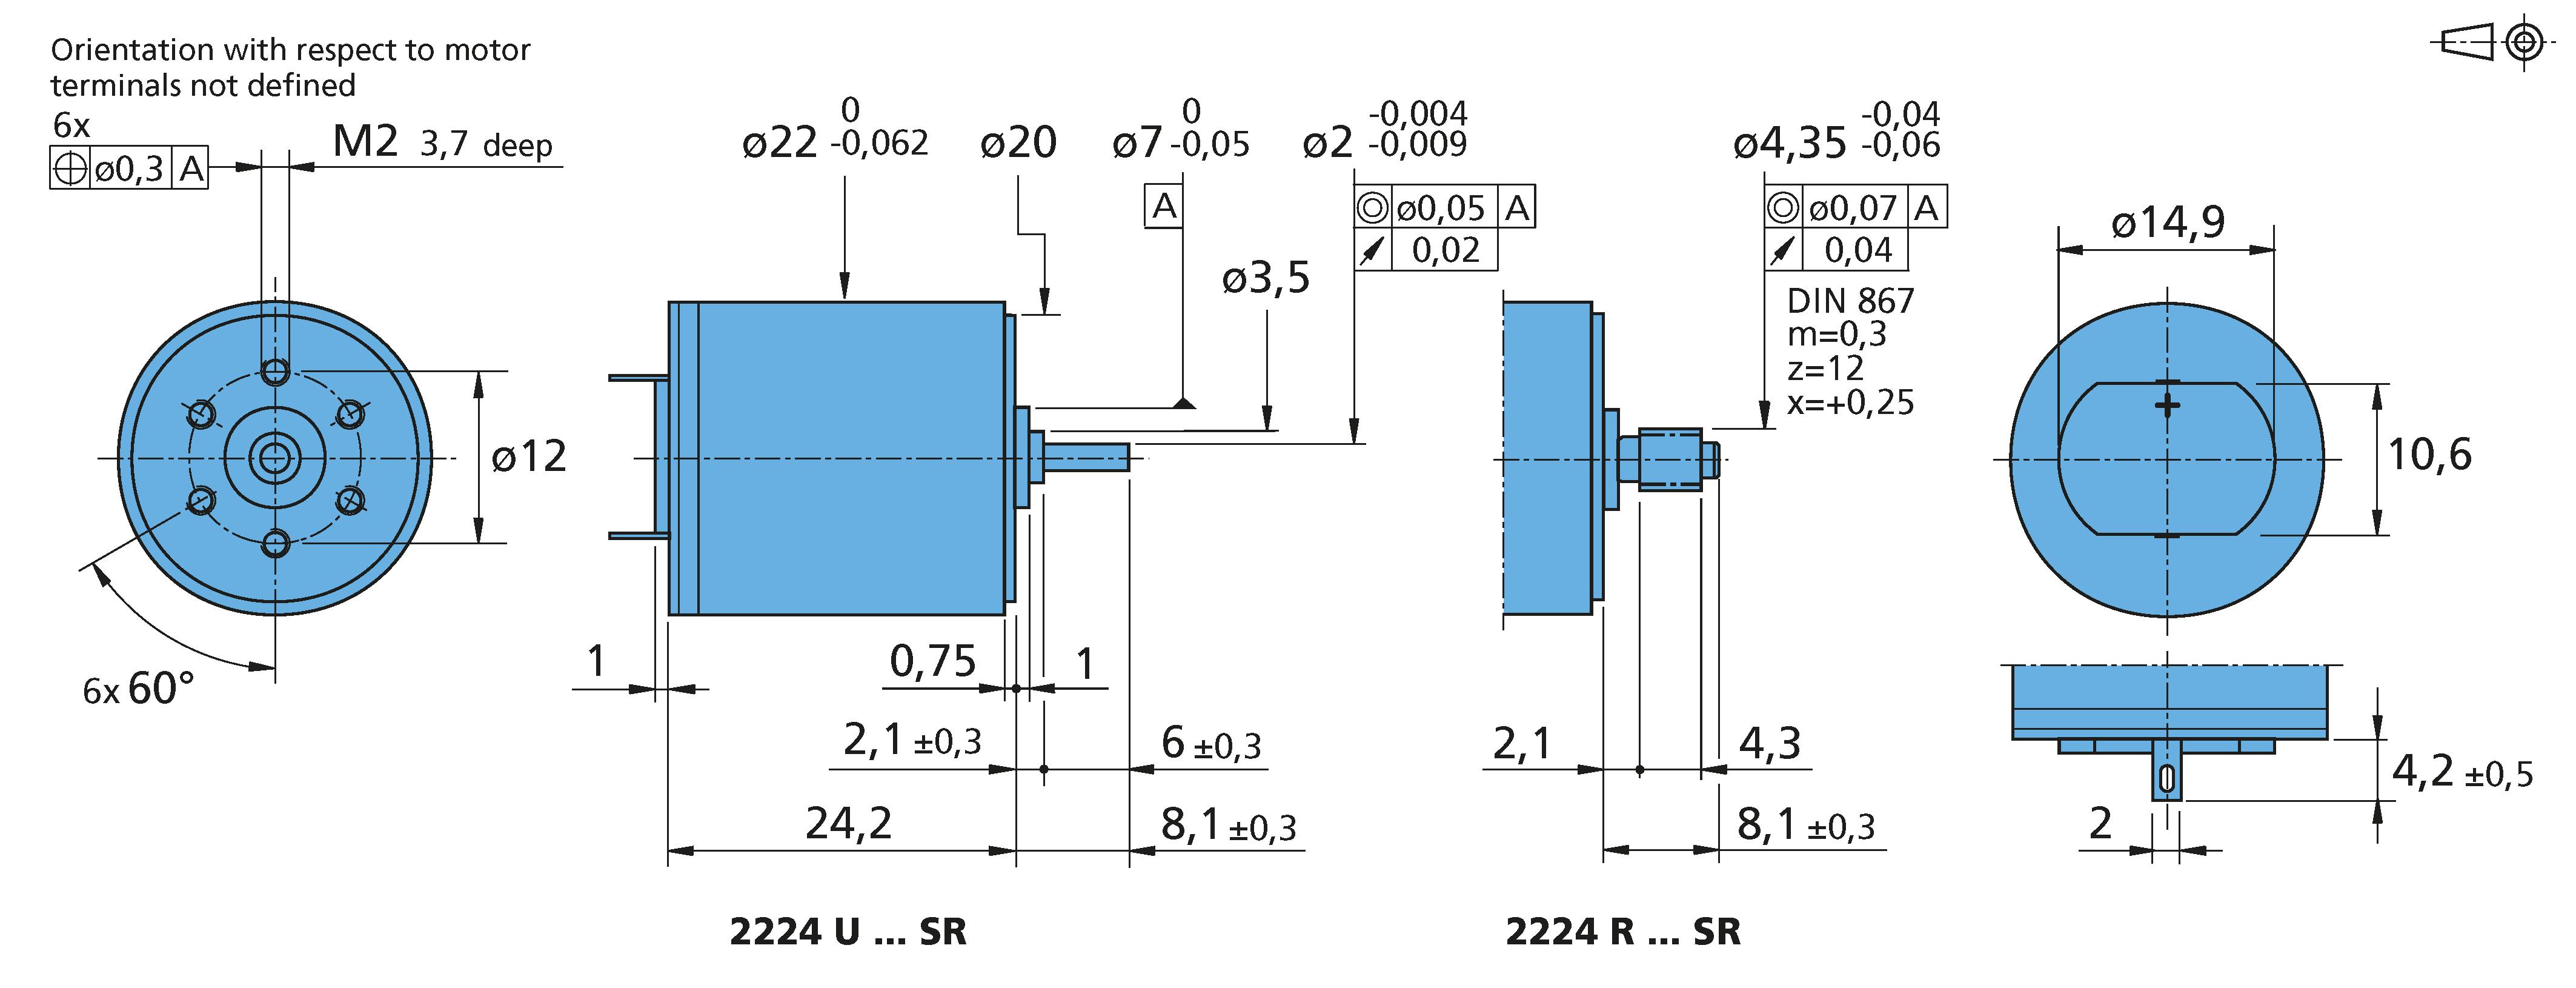 DC-Micromotors 2224...SR